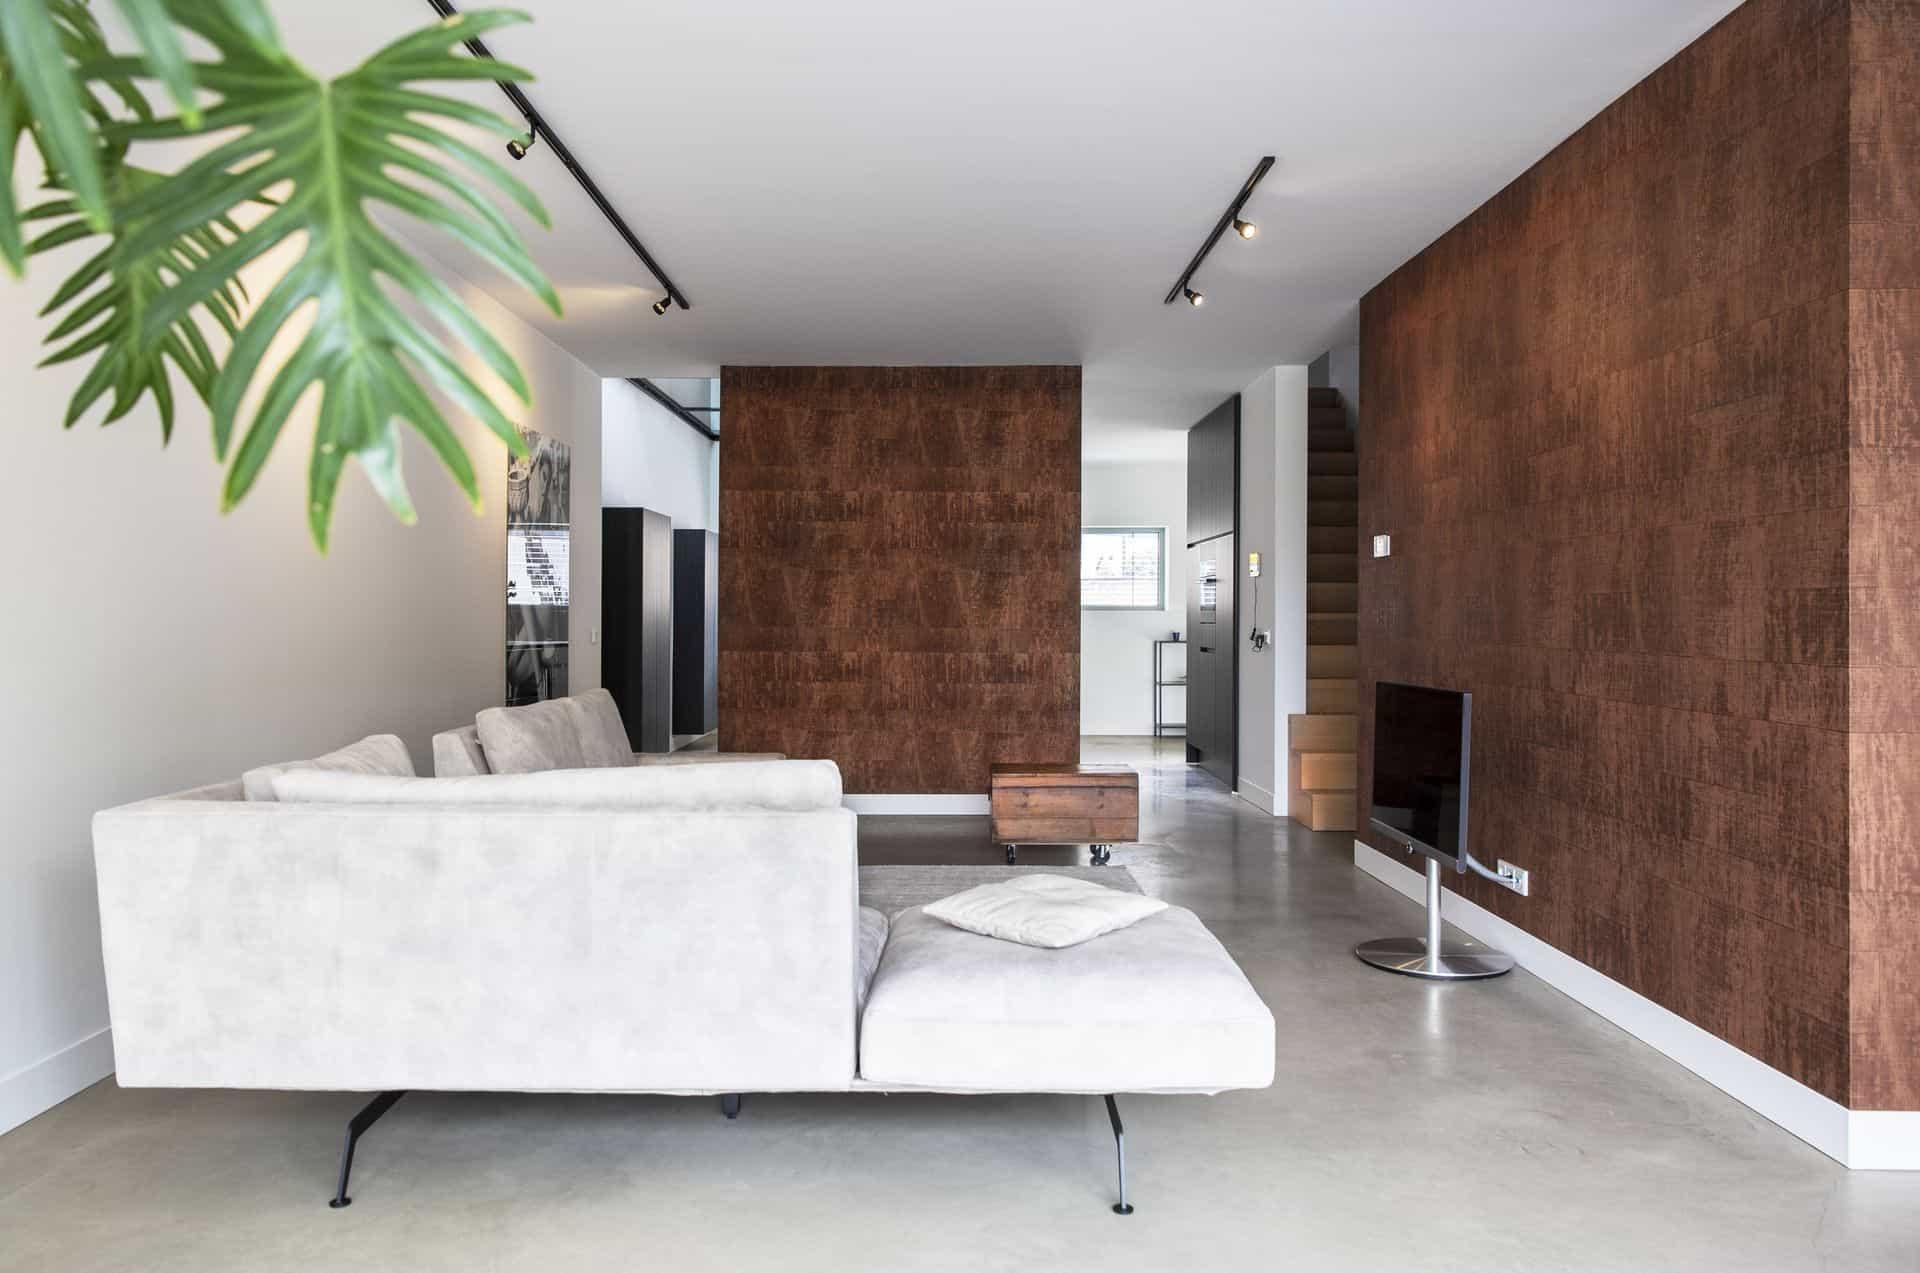 gevlinderde betonnen vloer, gevlinderde betonnen vloer woonkamer